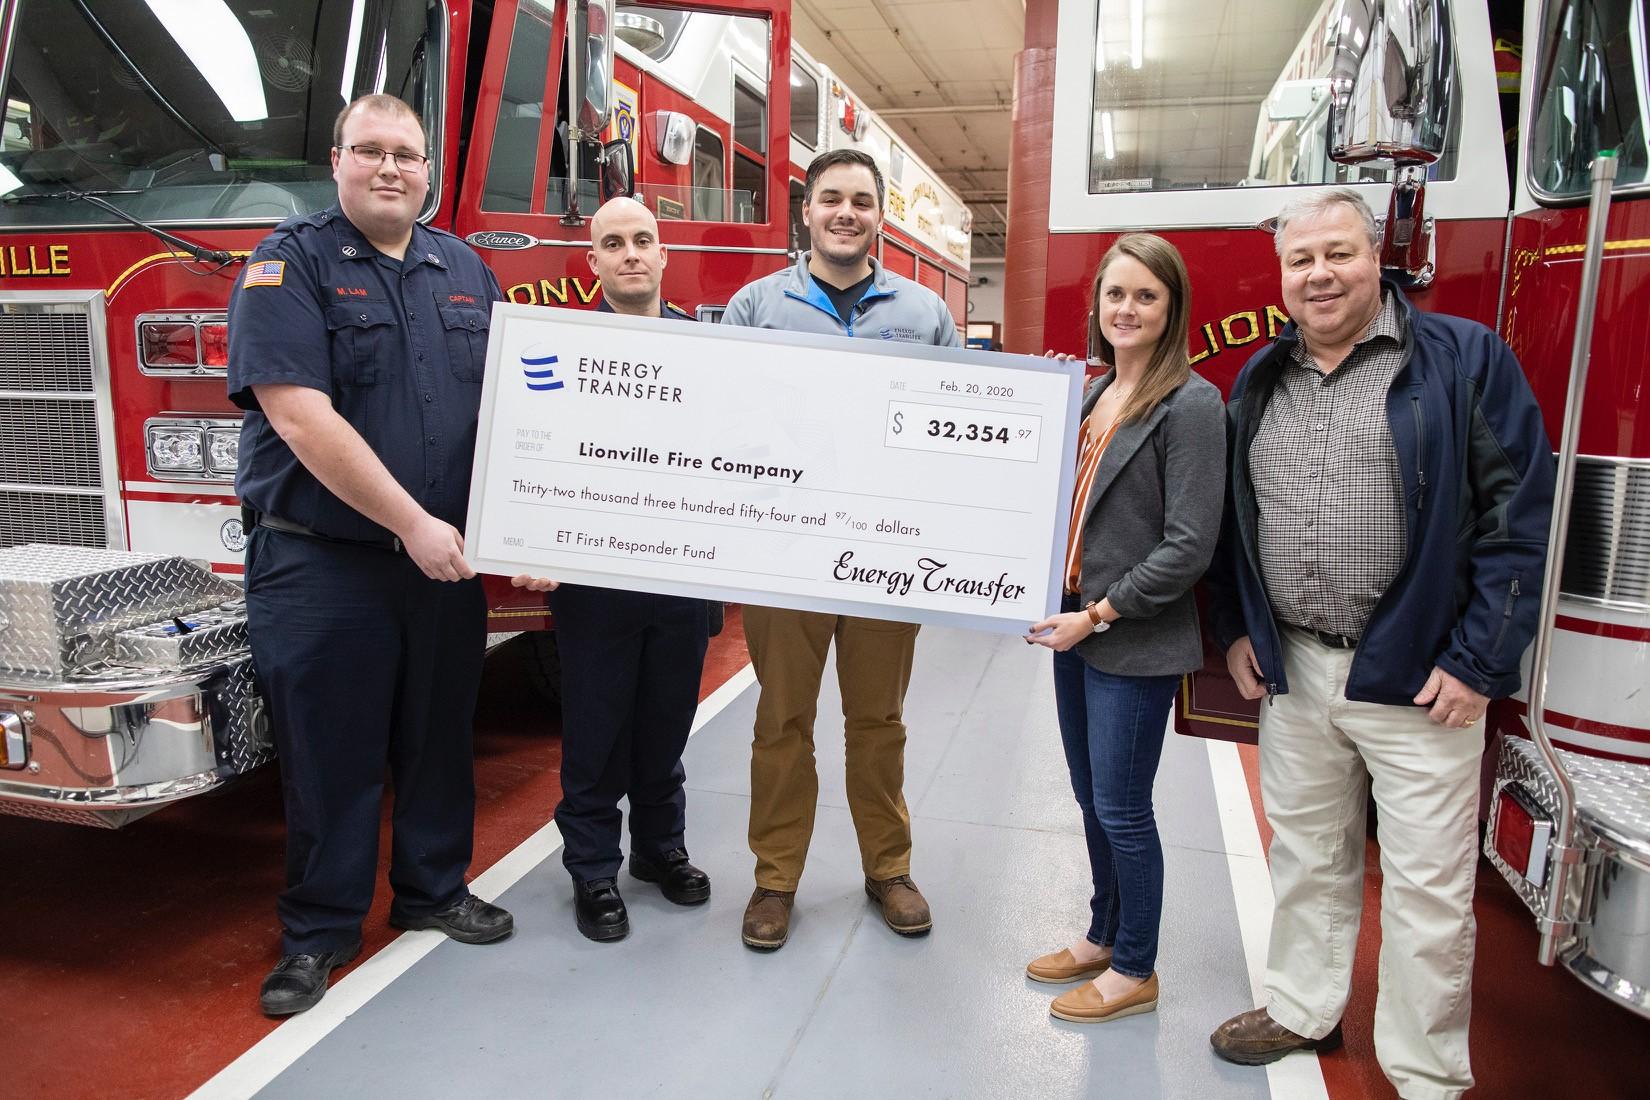 Energy Transfer Awards Lionville Fire Company $32,000 Grant for Emergency Response Equipment